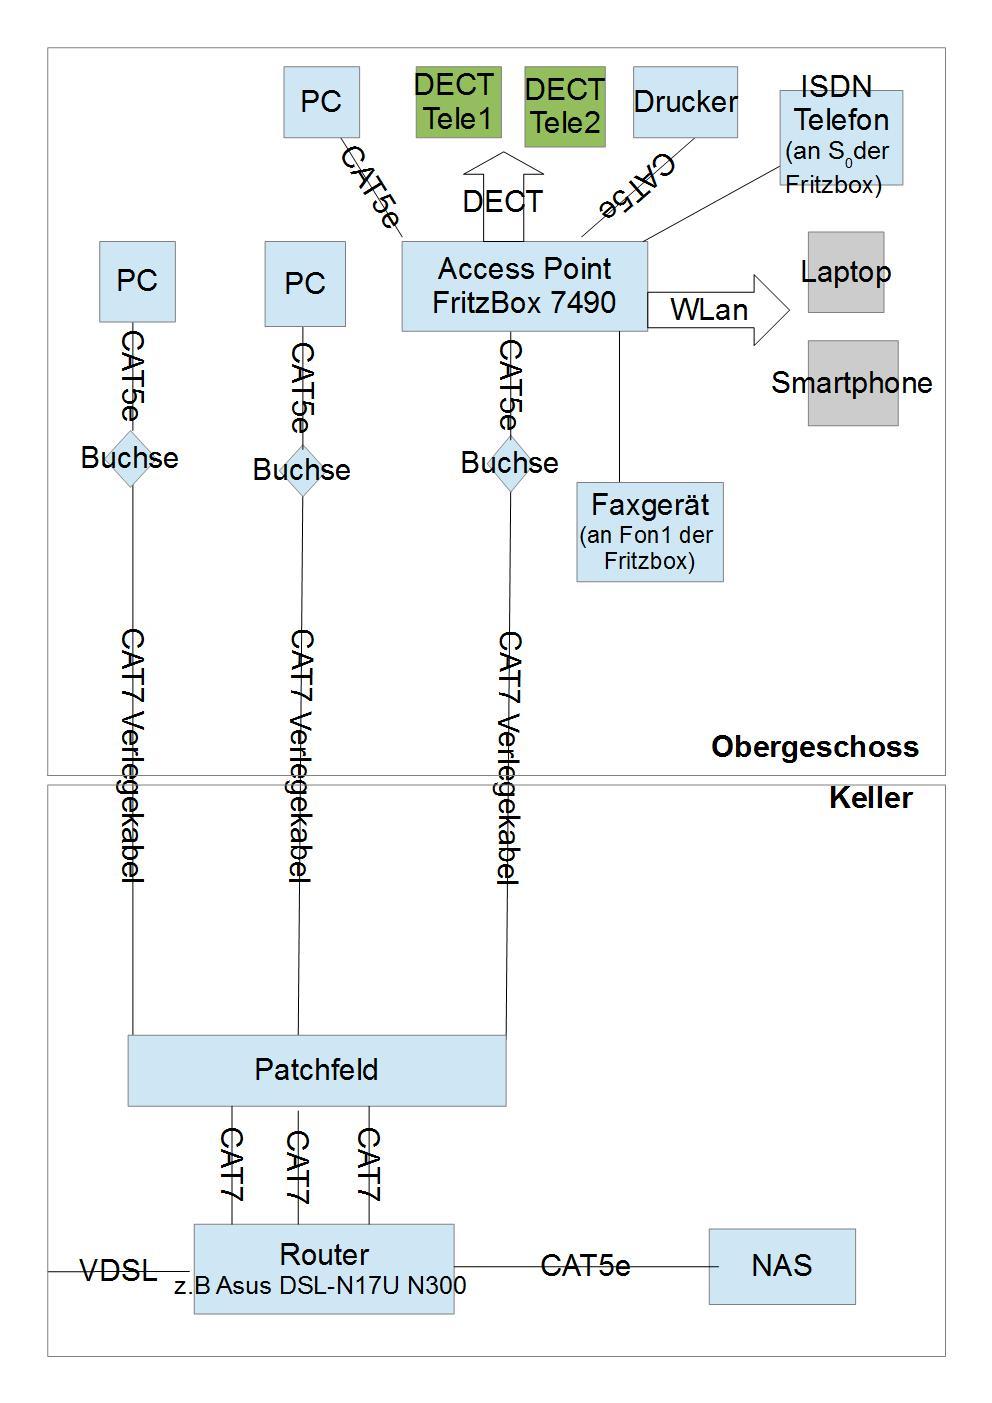 Niedlich Verkabelung S Bilder - Elektrische Schaltplan-Ideen ...